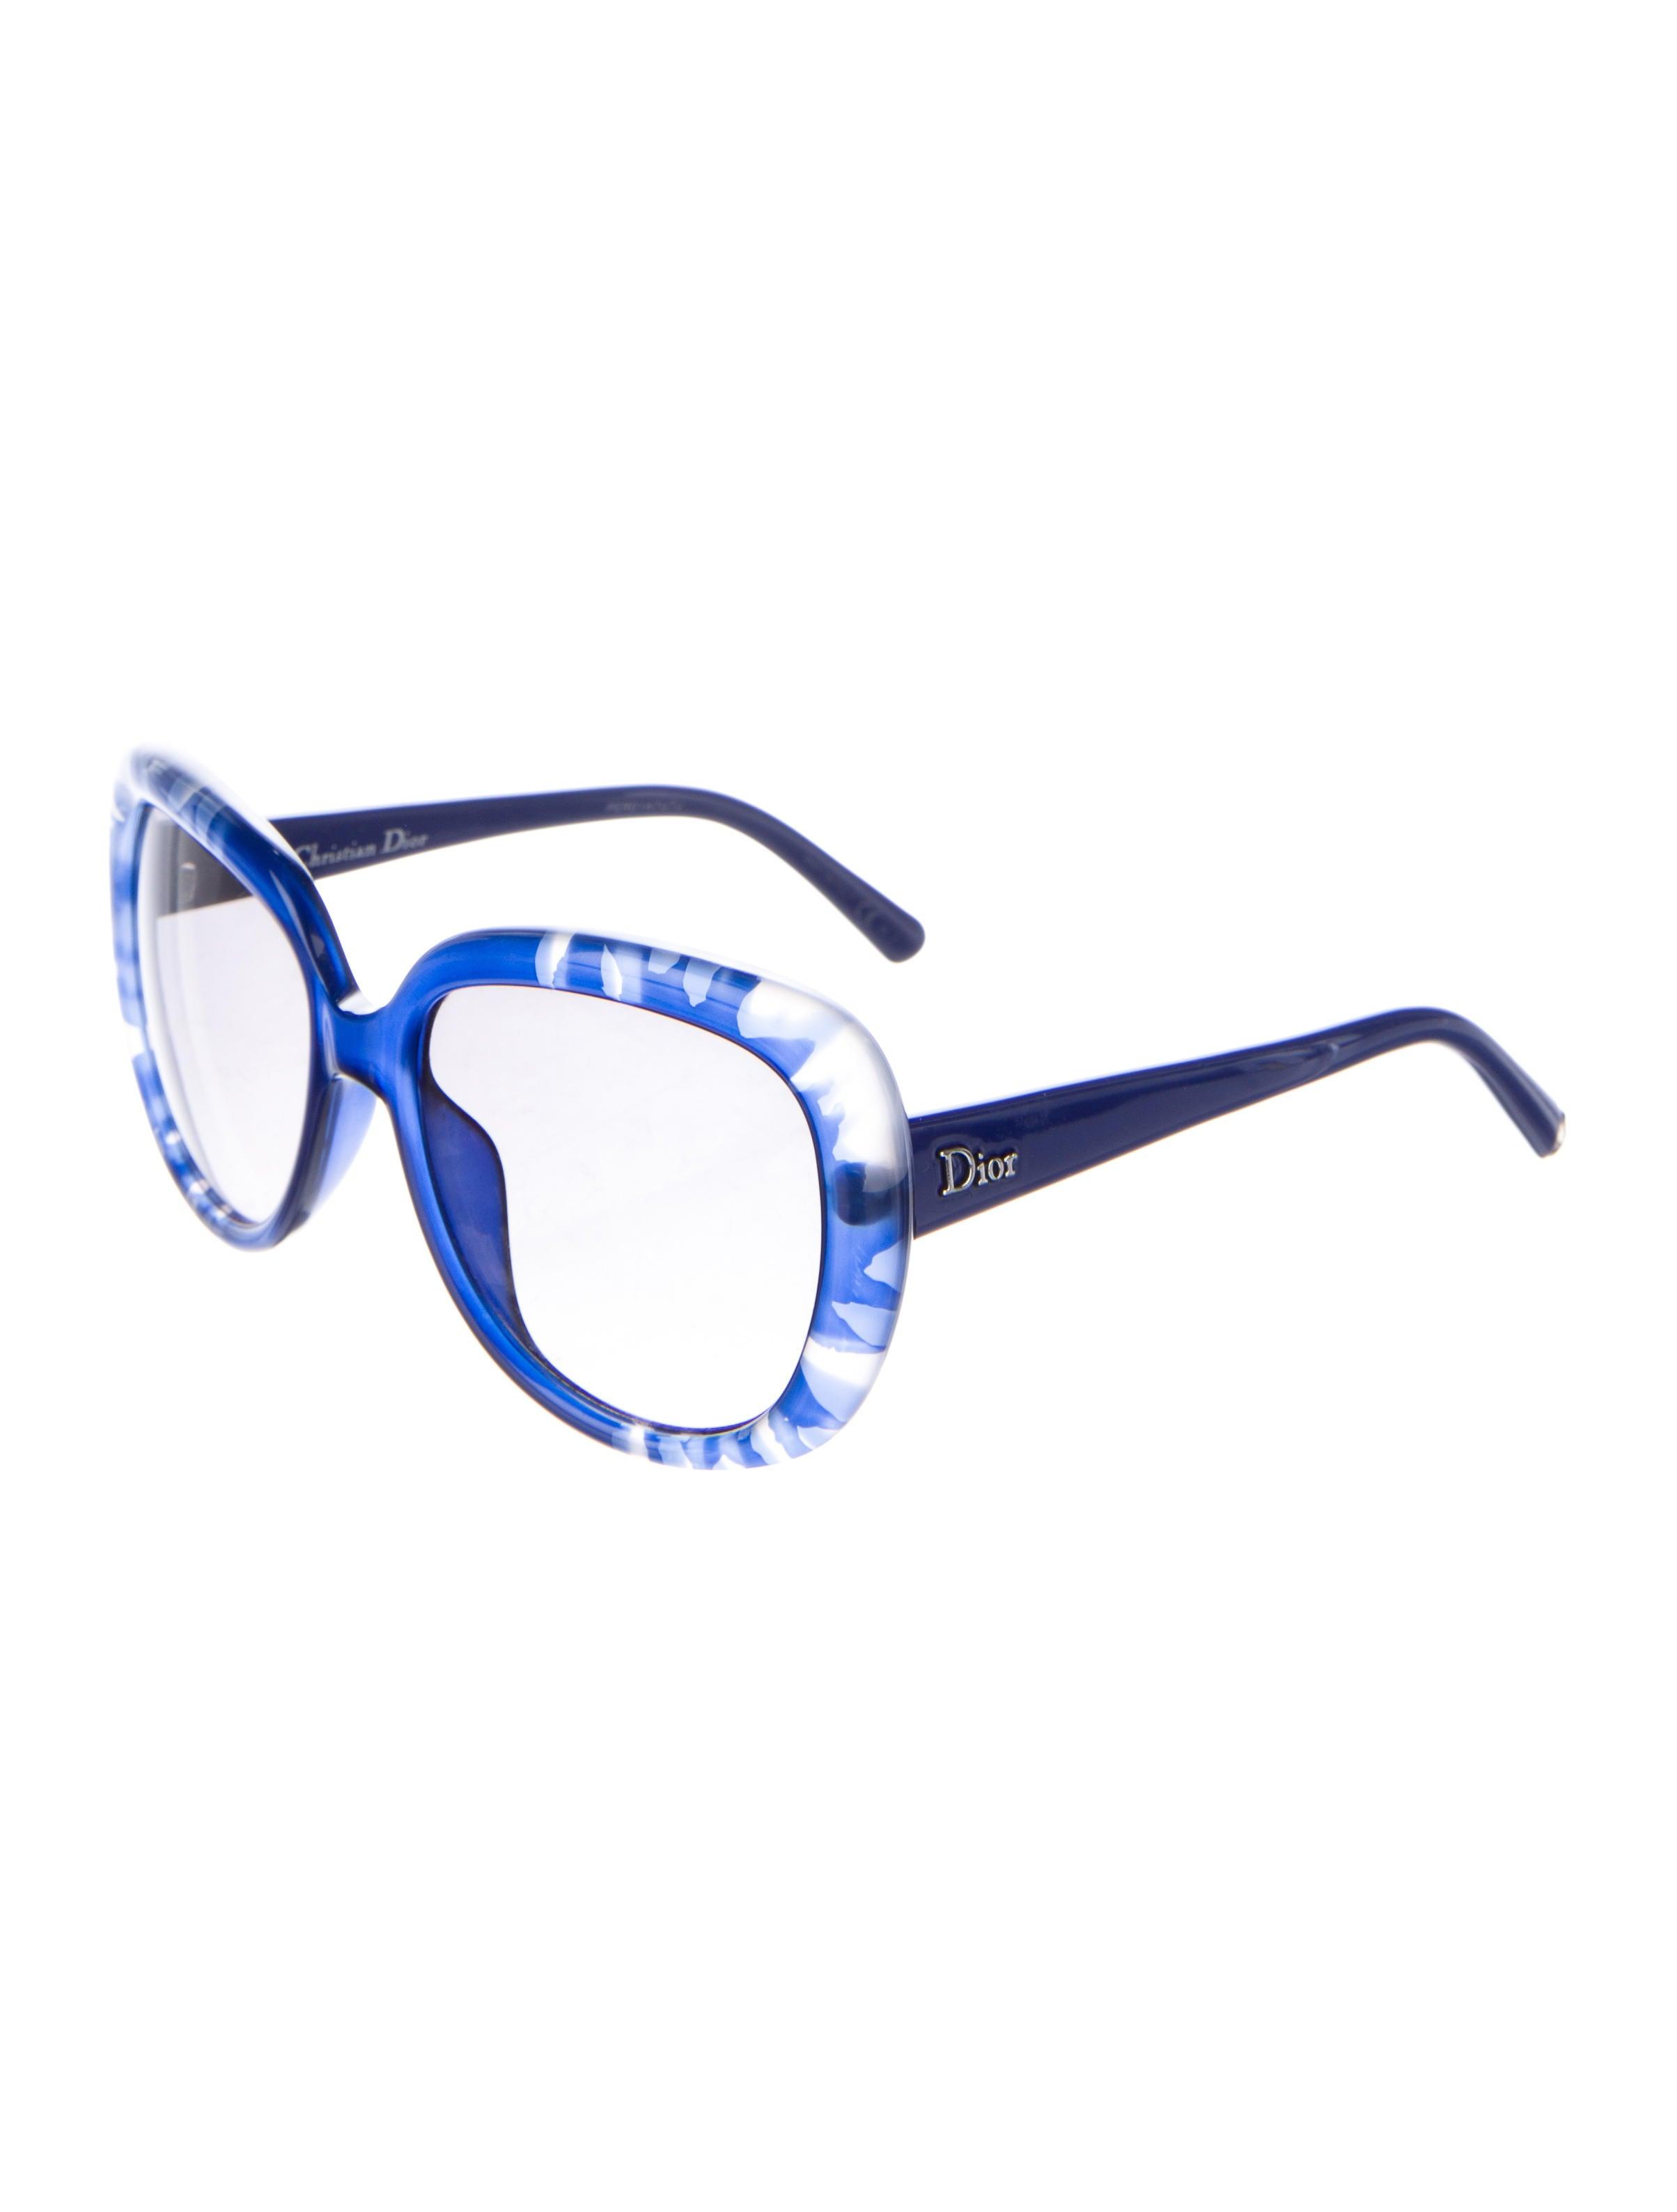 58e20ba014c Christian Dior Tie Dye Butterfly Sunglasses - Accessories - CHR45382